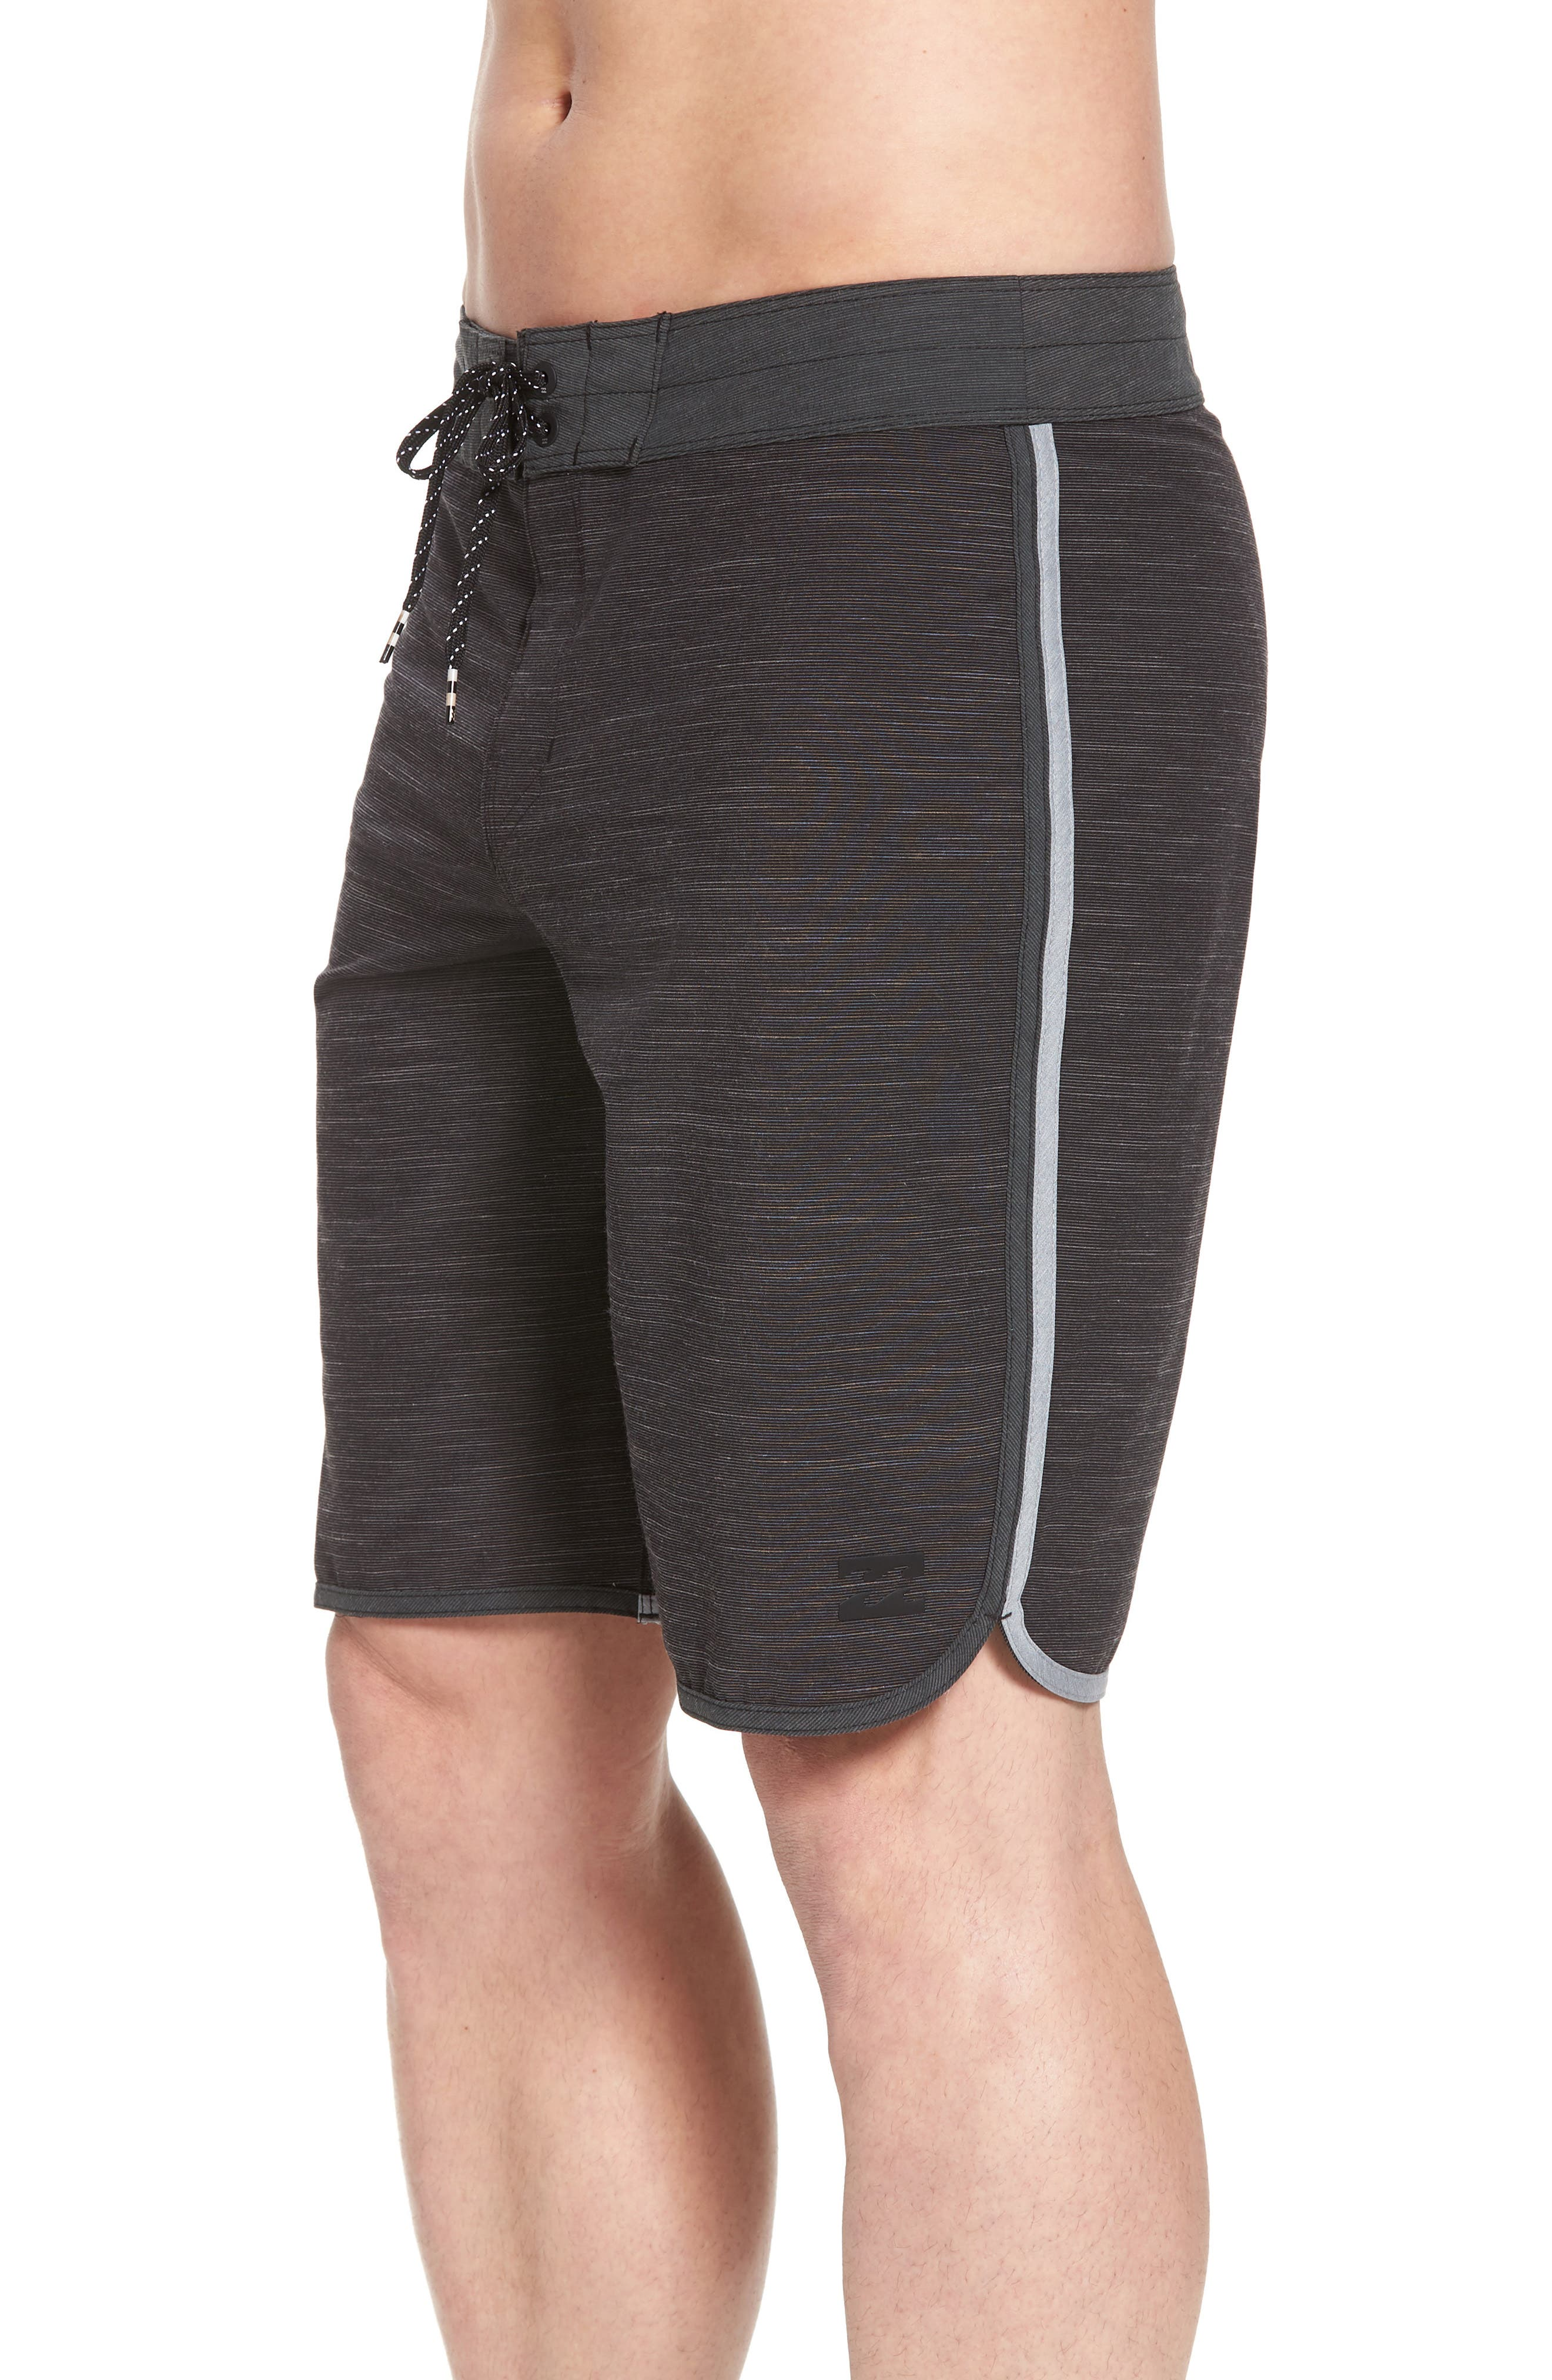 73 X Short Board Shorts,                             Alternate thumbnail 4, color,                             001